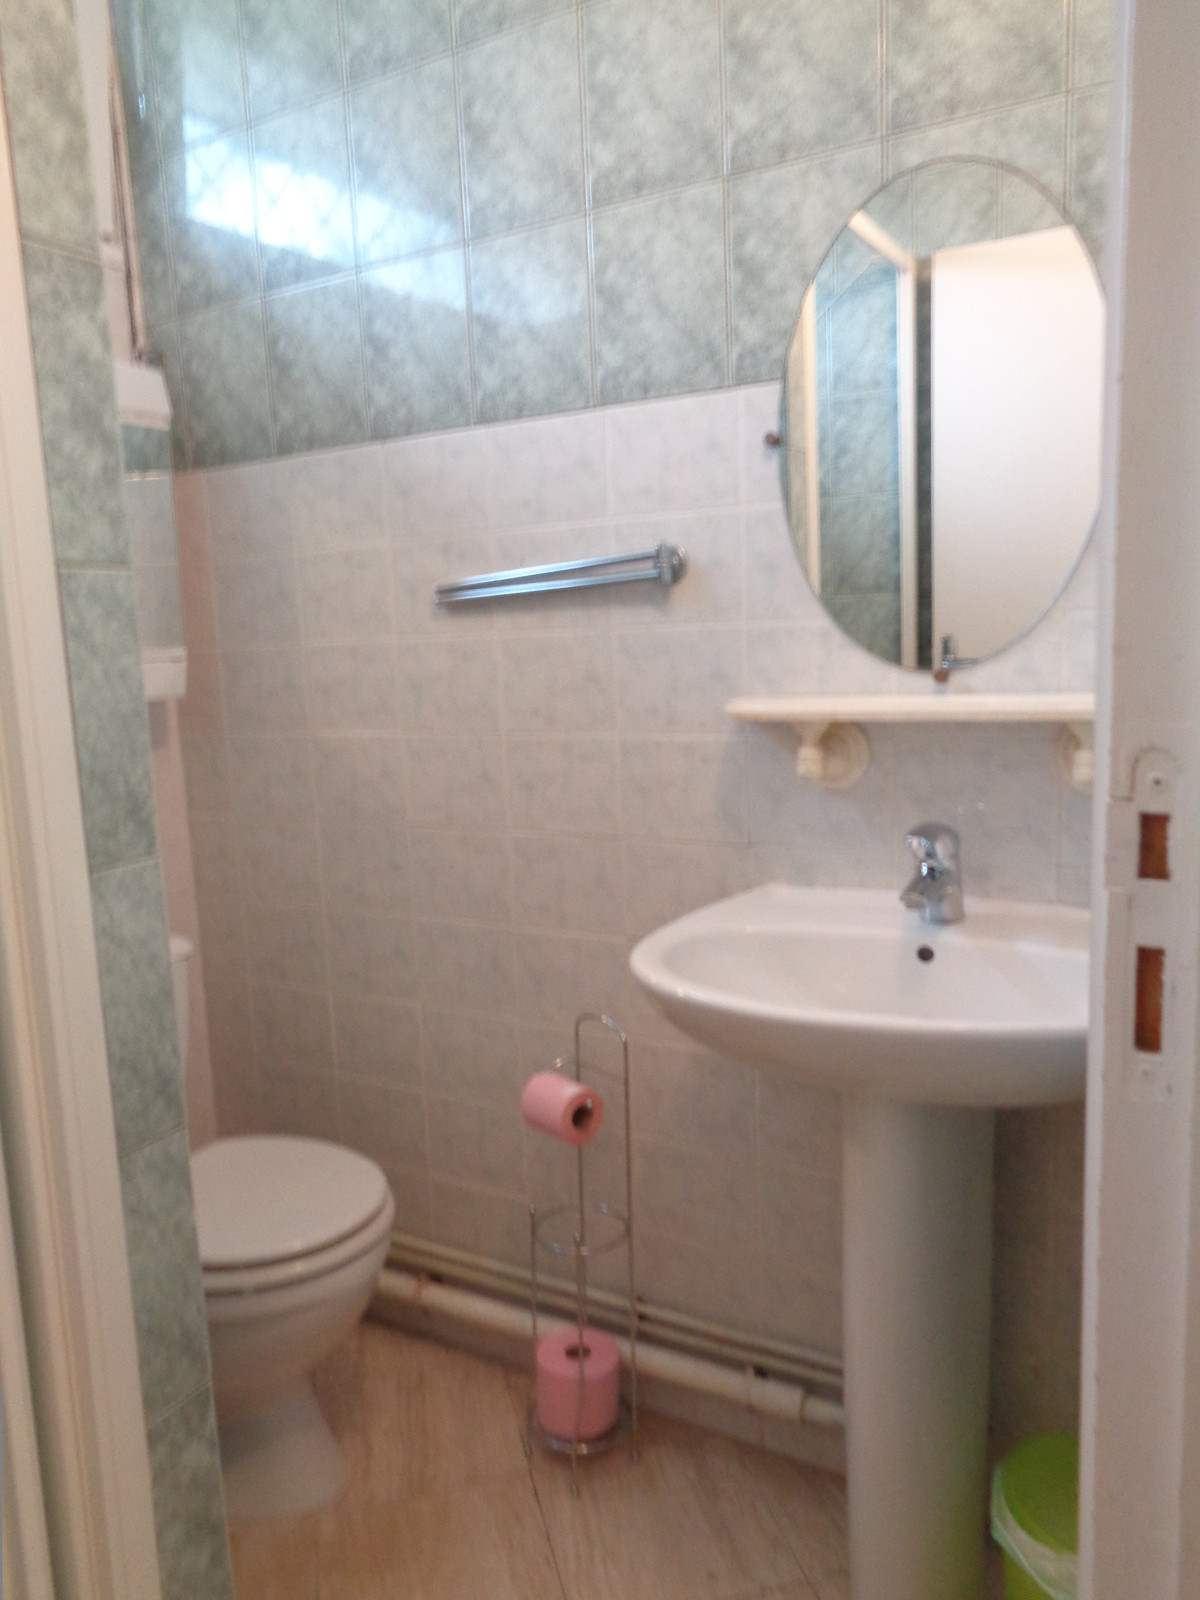 A2 Salle de bain - WC 2.JPG